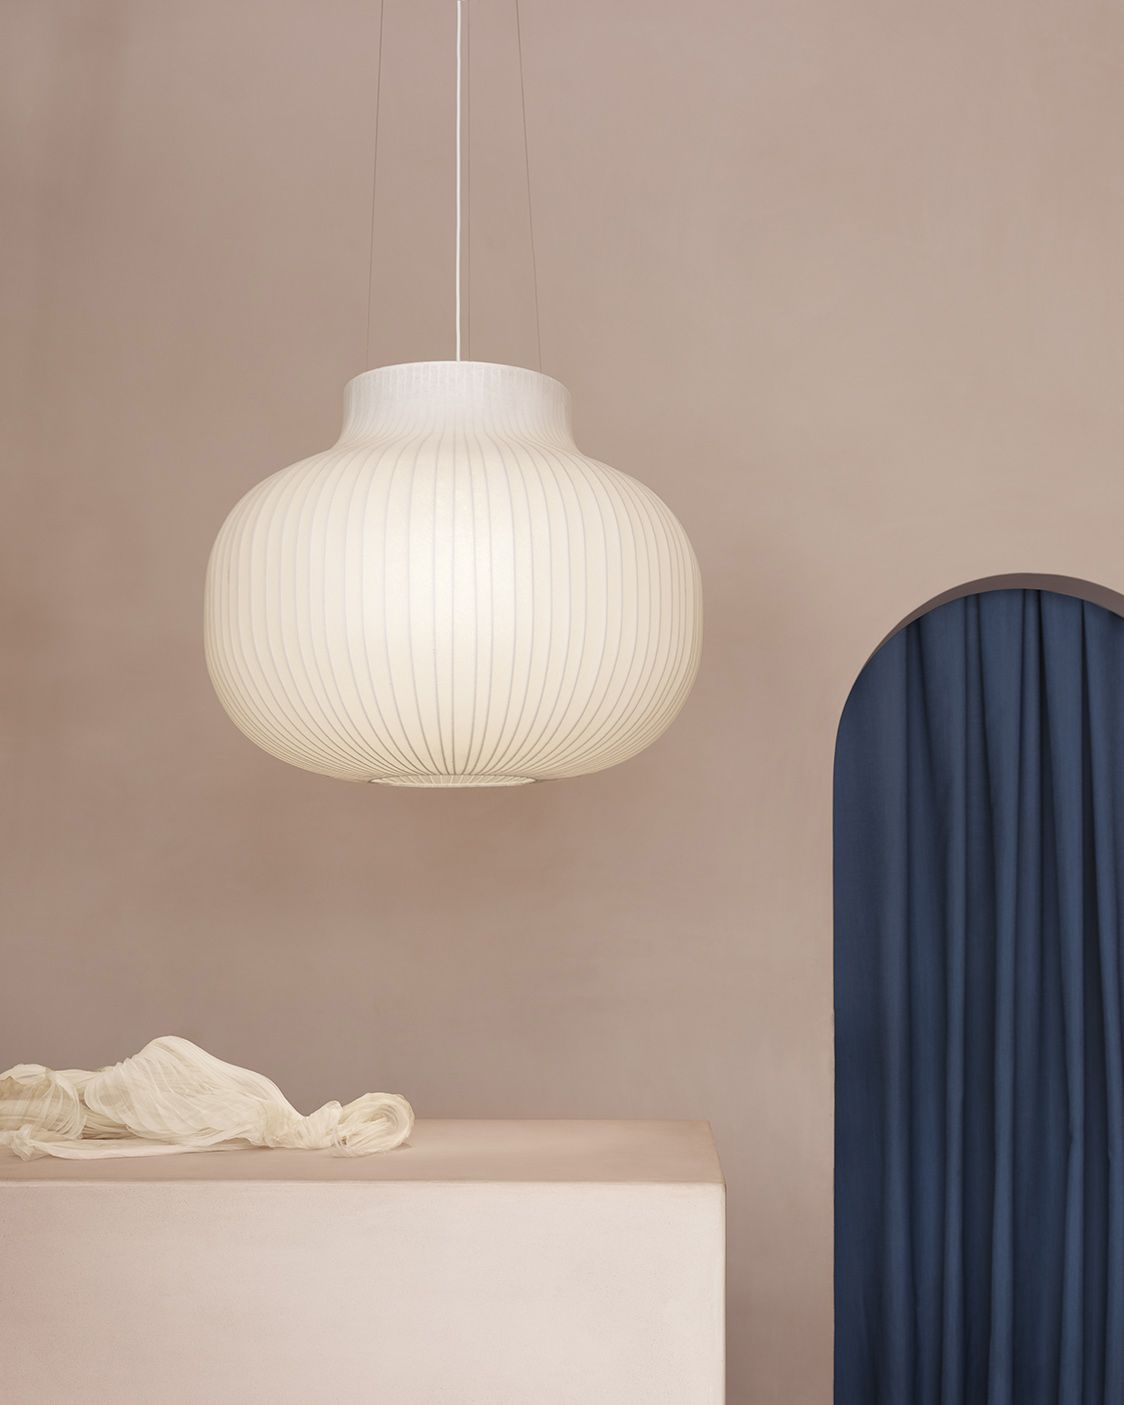 Modern And Minimal Lighting Inspiration